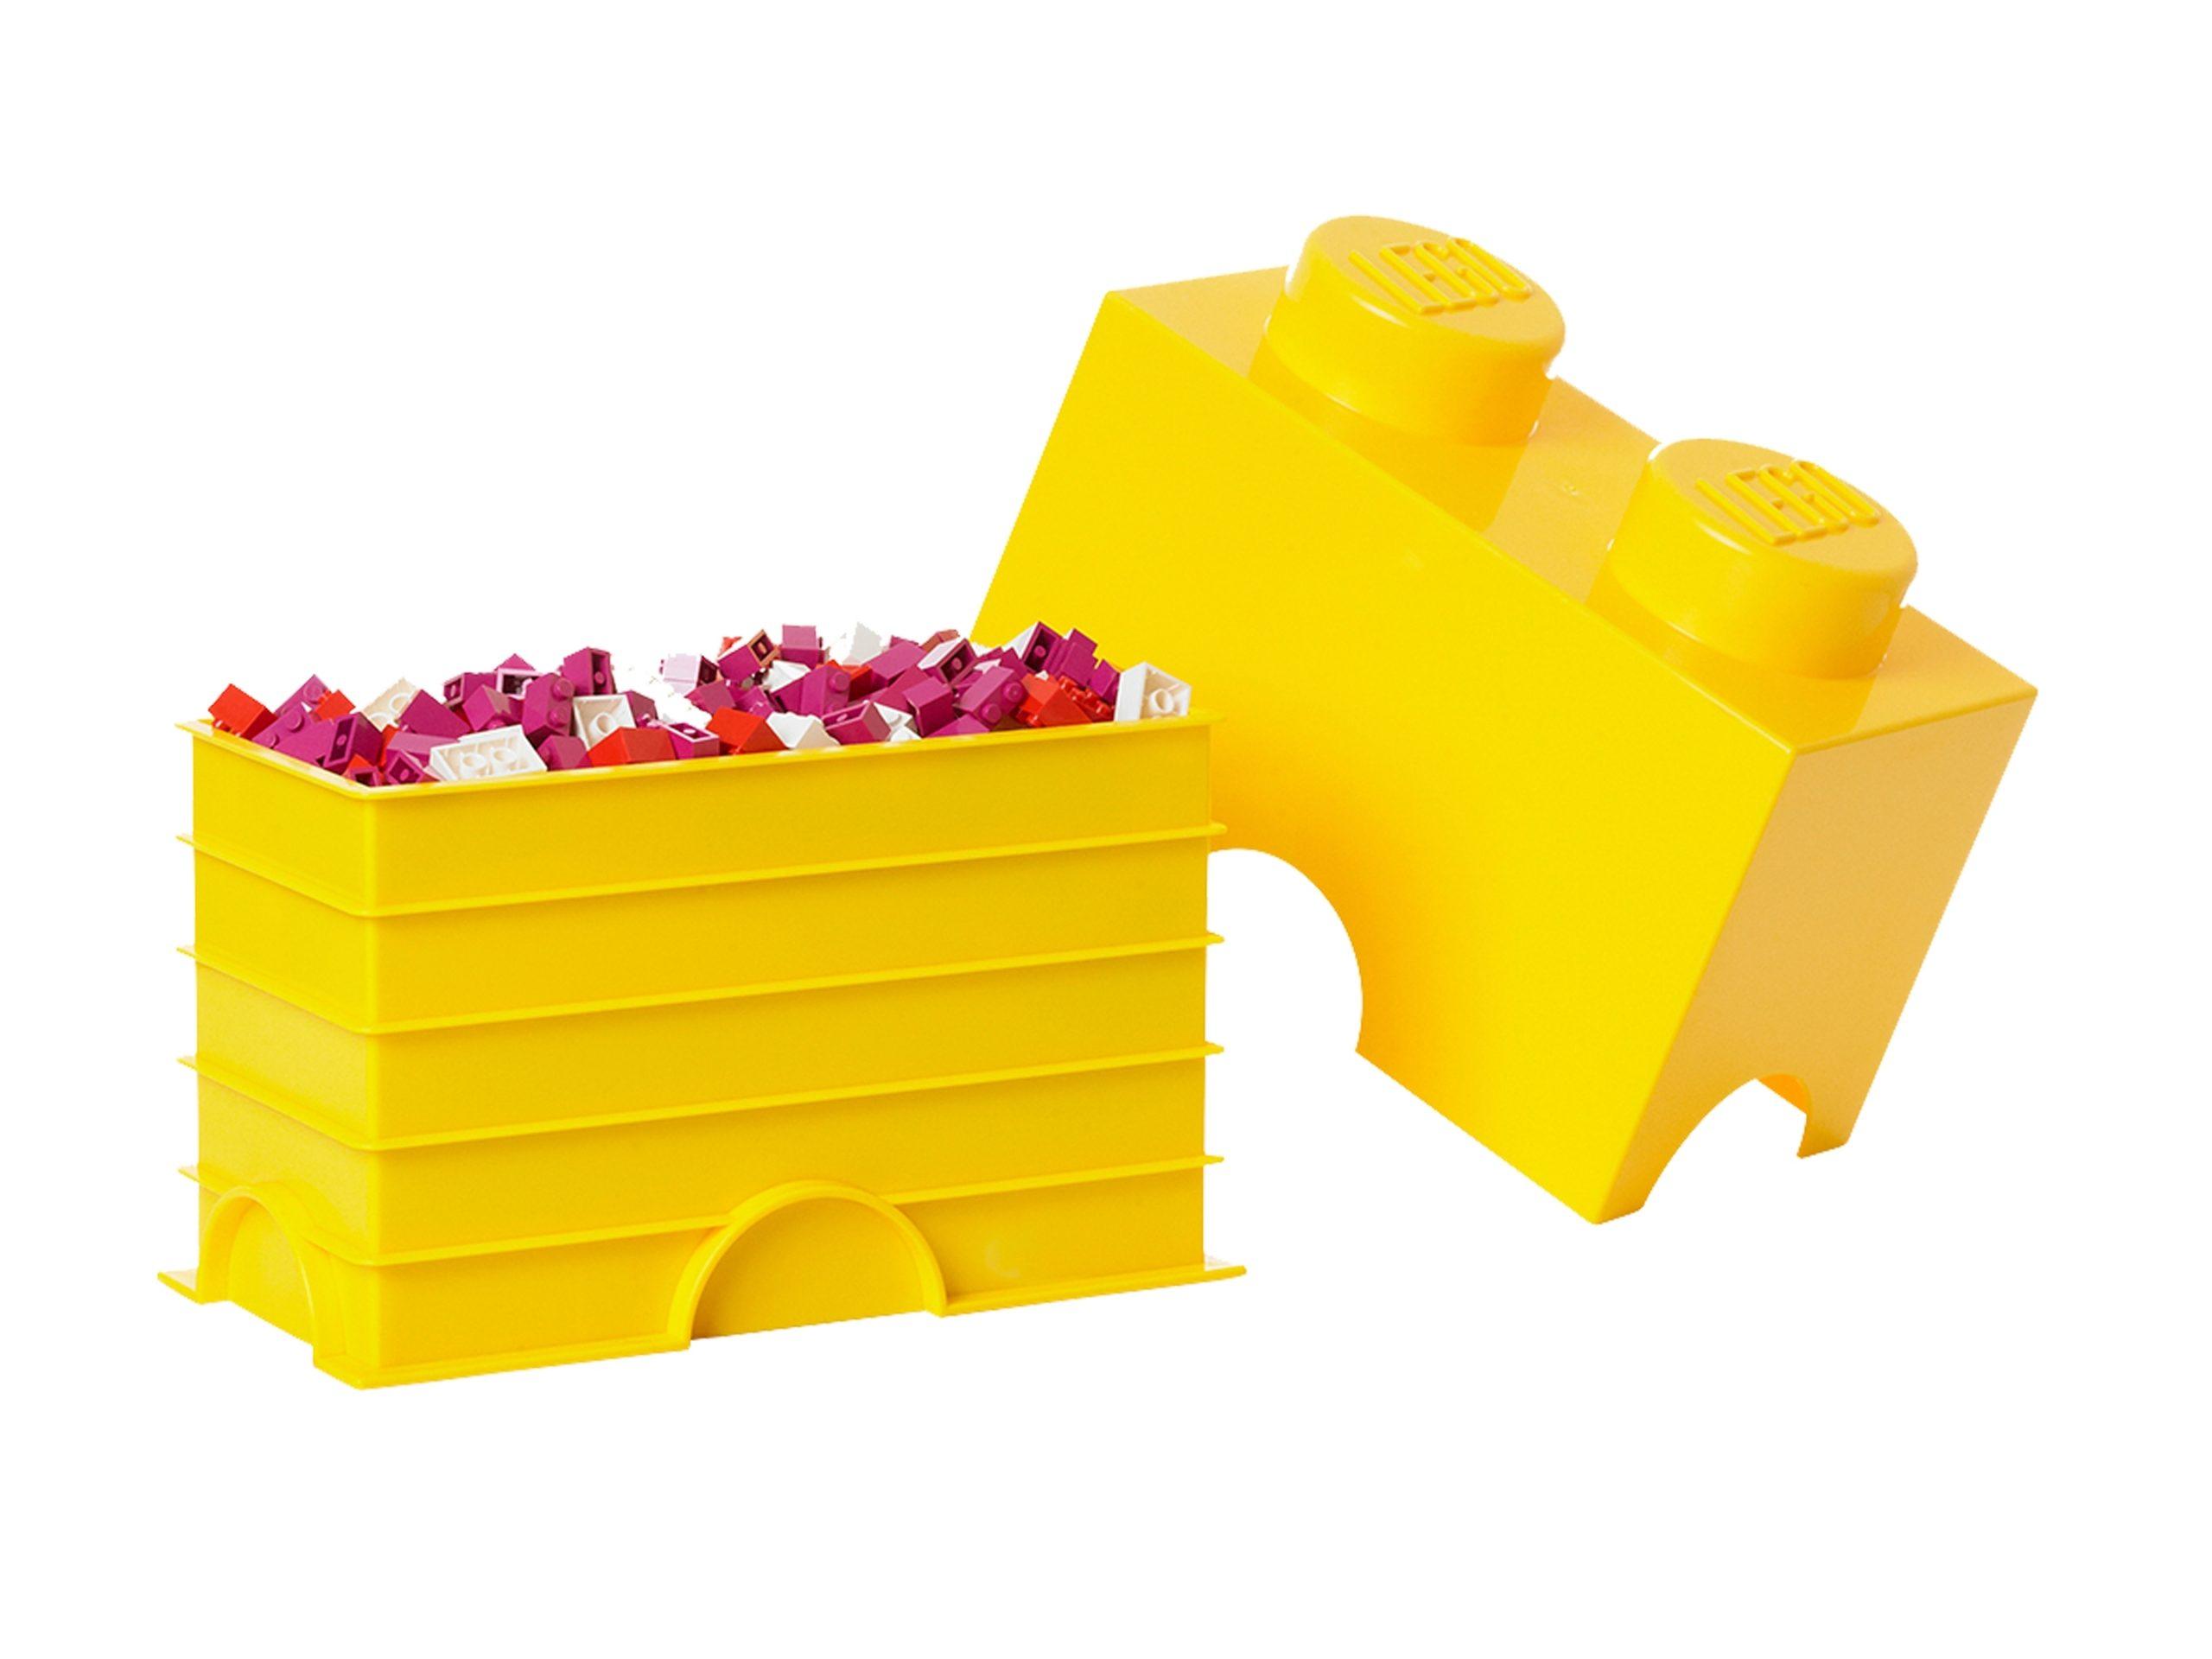 lego 5004891 2 stud yellow storage brick scaled